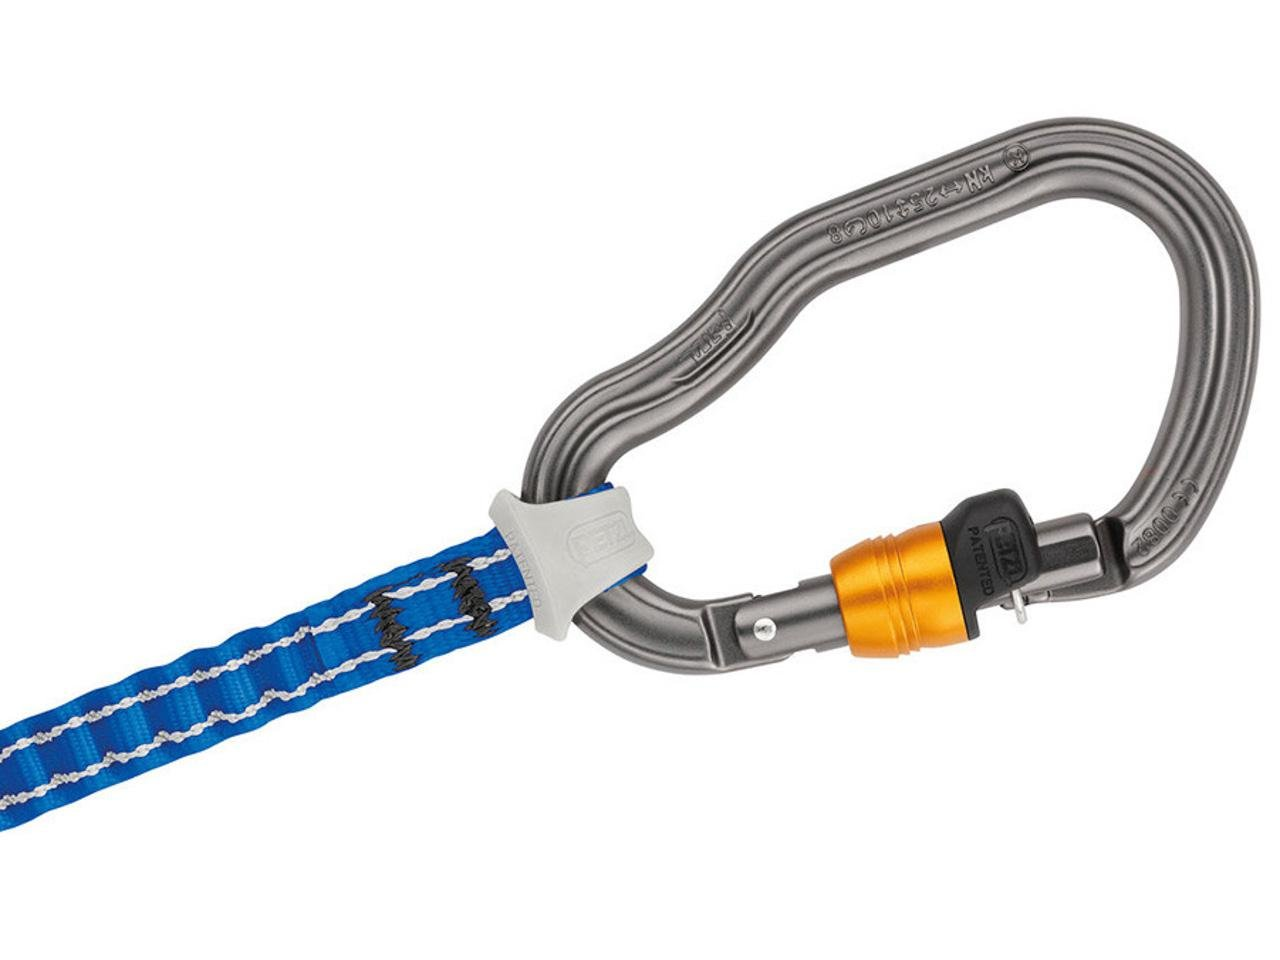 Klettersteigset Premium Attac : Petzl scorpio vertigo lanyard klettersteigset mehrfarbig uni